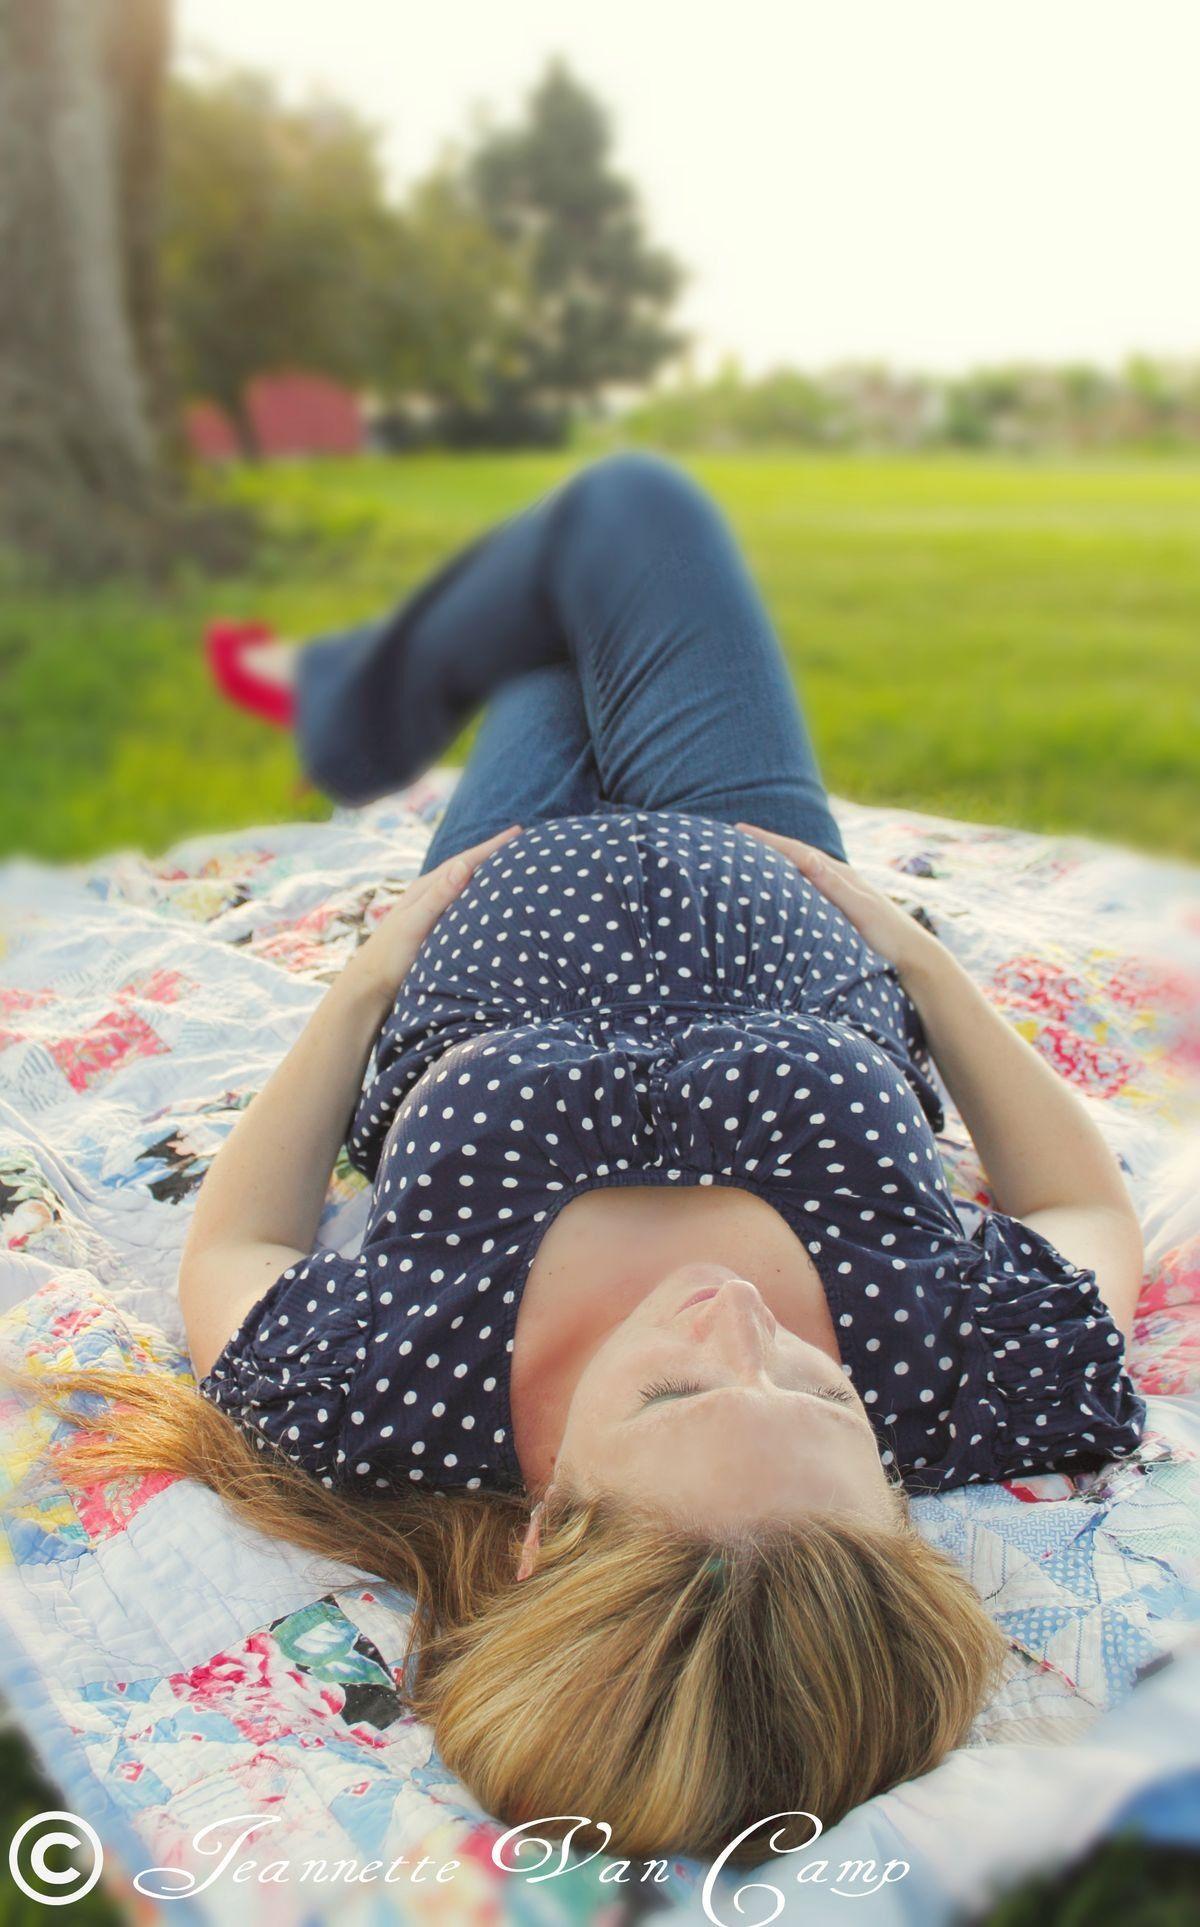 Maternity photo shoot idea for the park togally